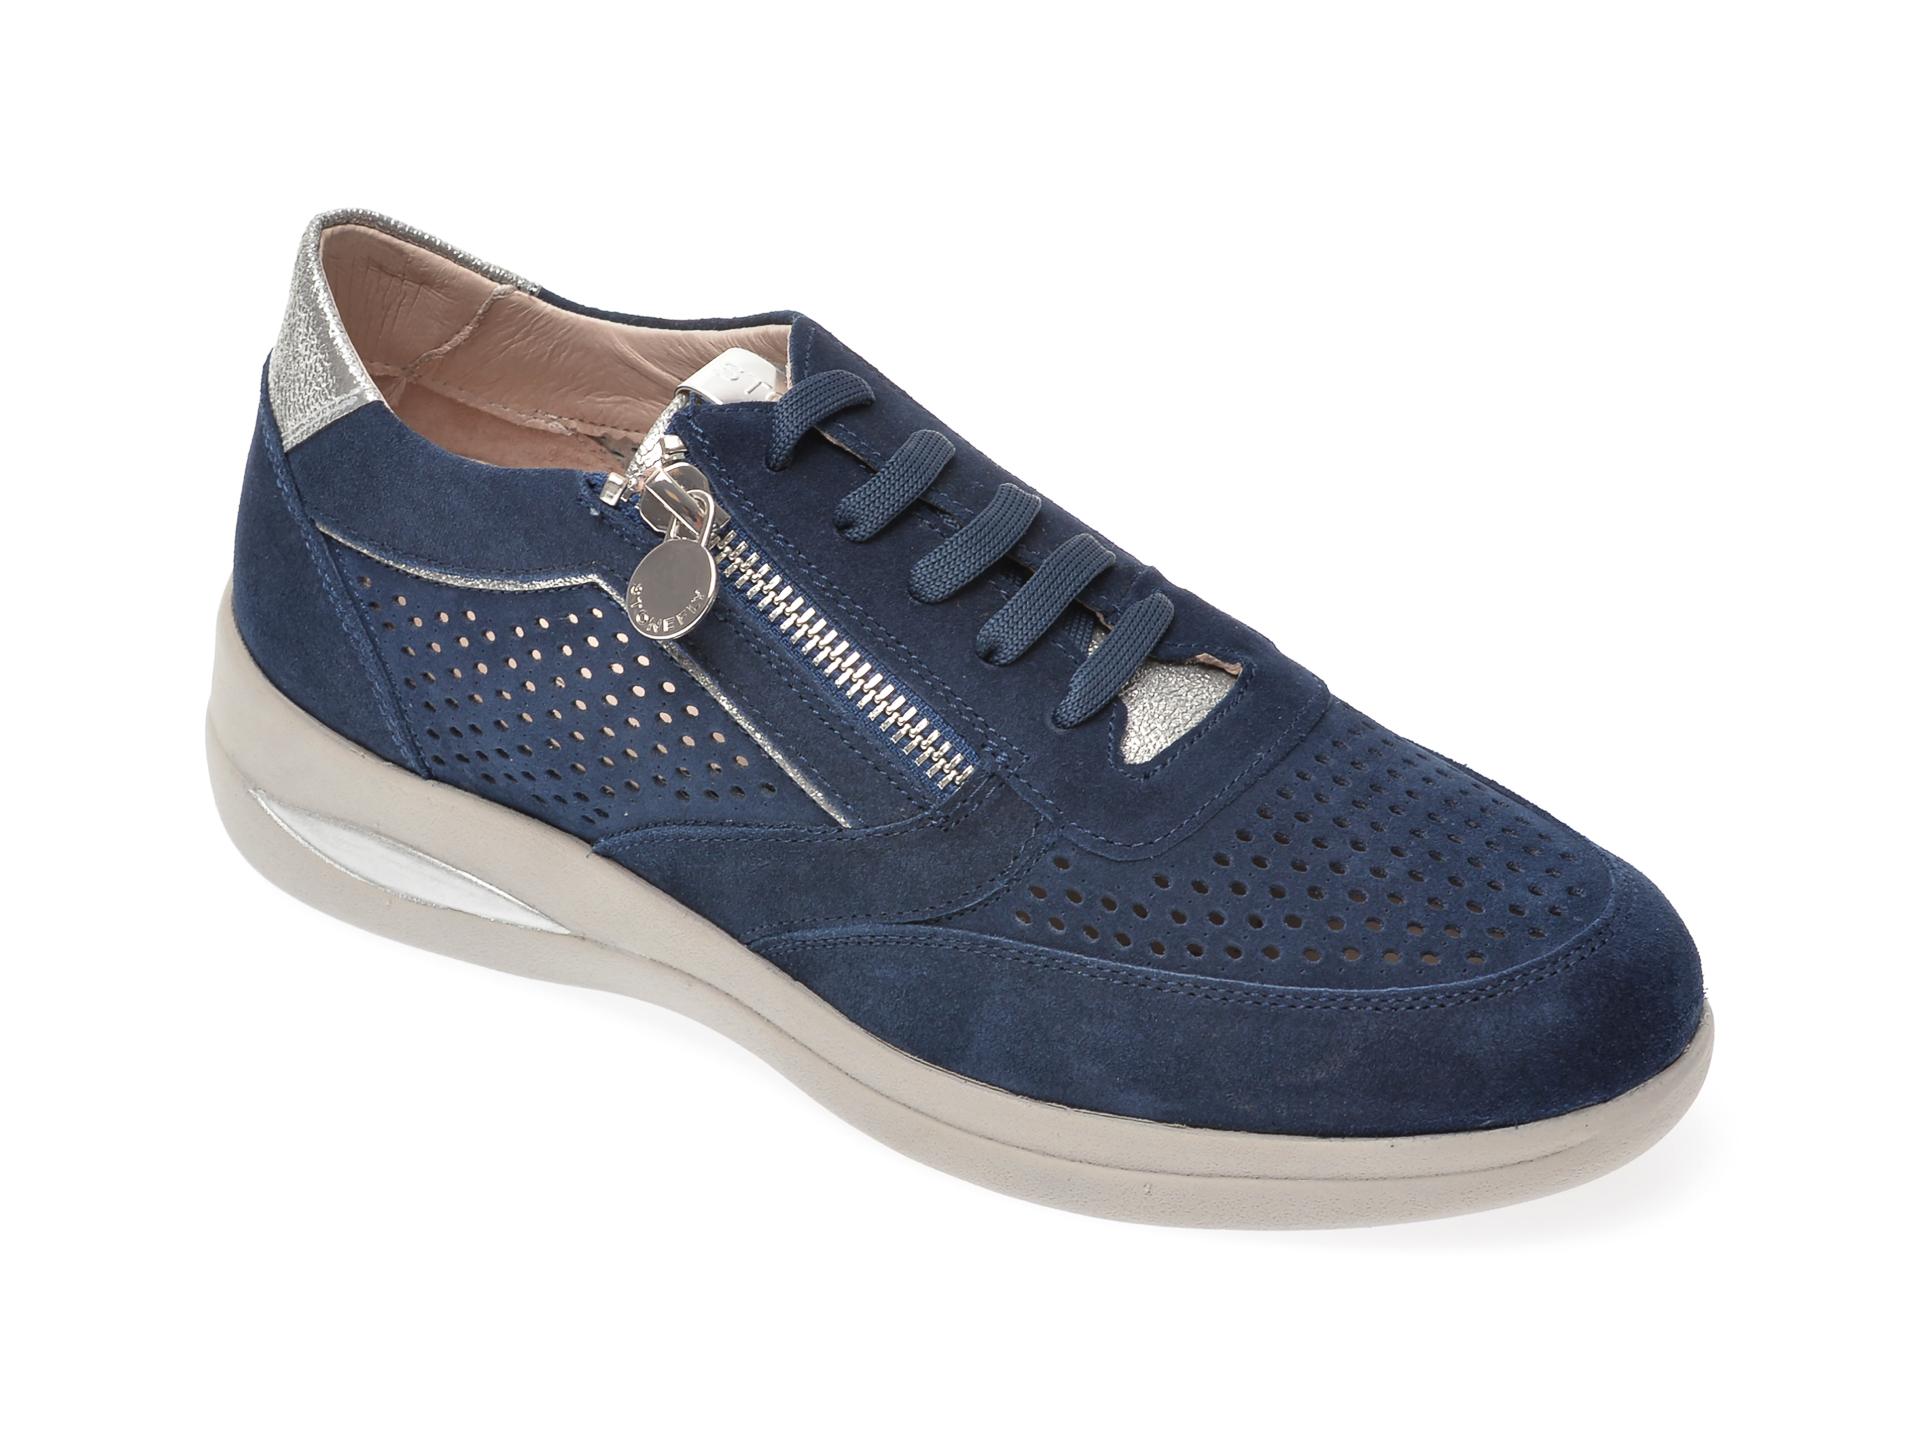 Pantofi Stonefly Bleumarin, Aurora5, Din Piele Intoarsa